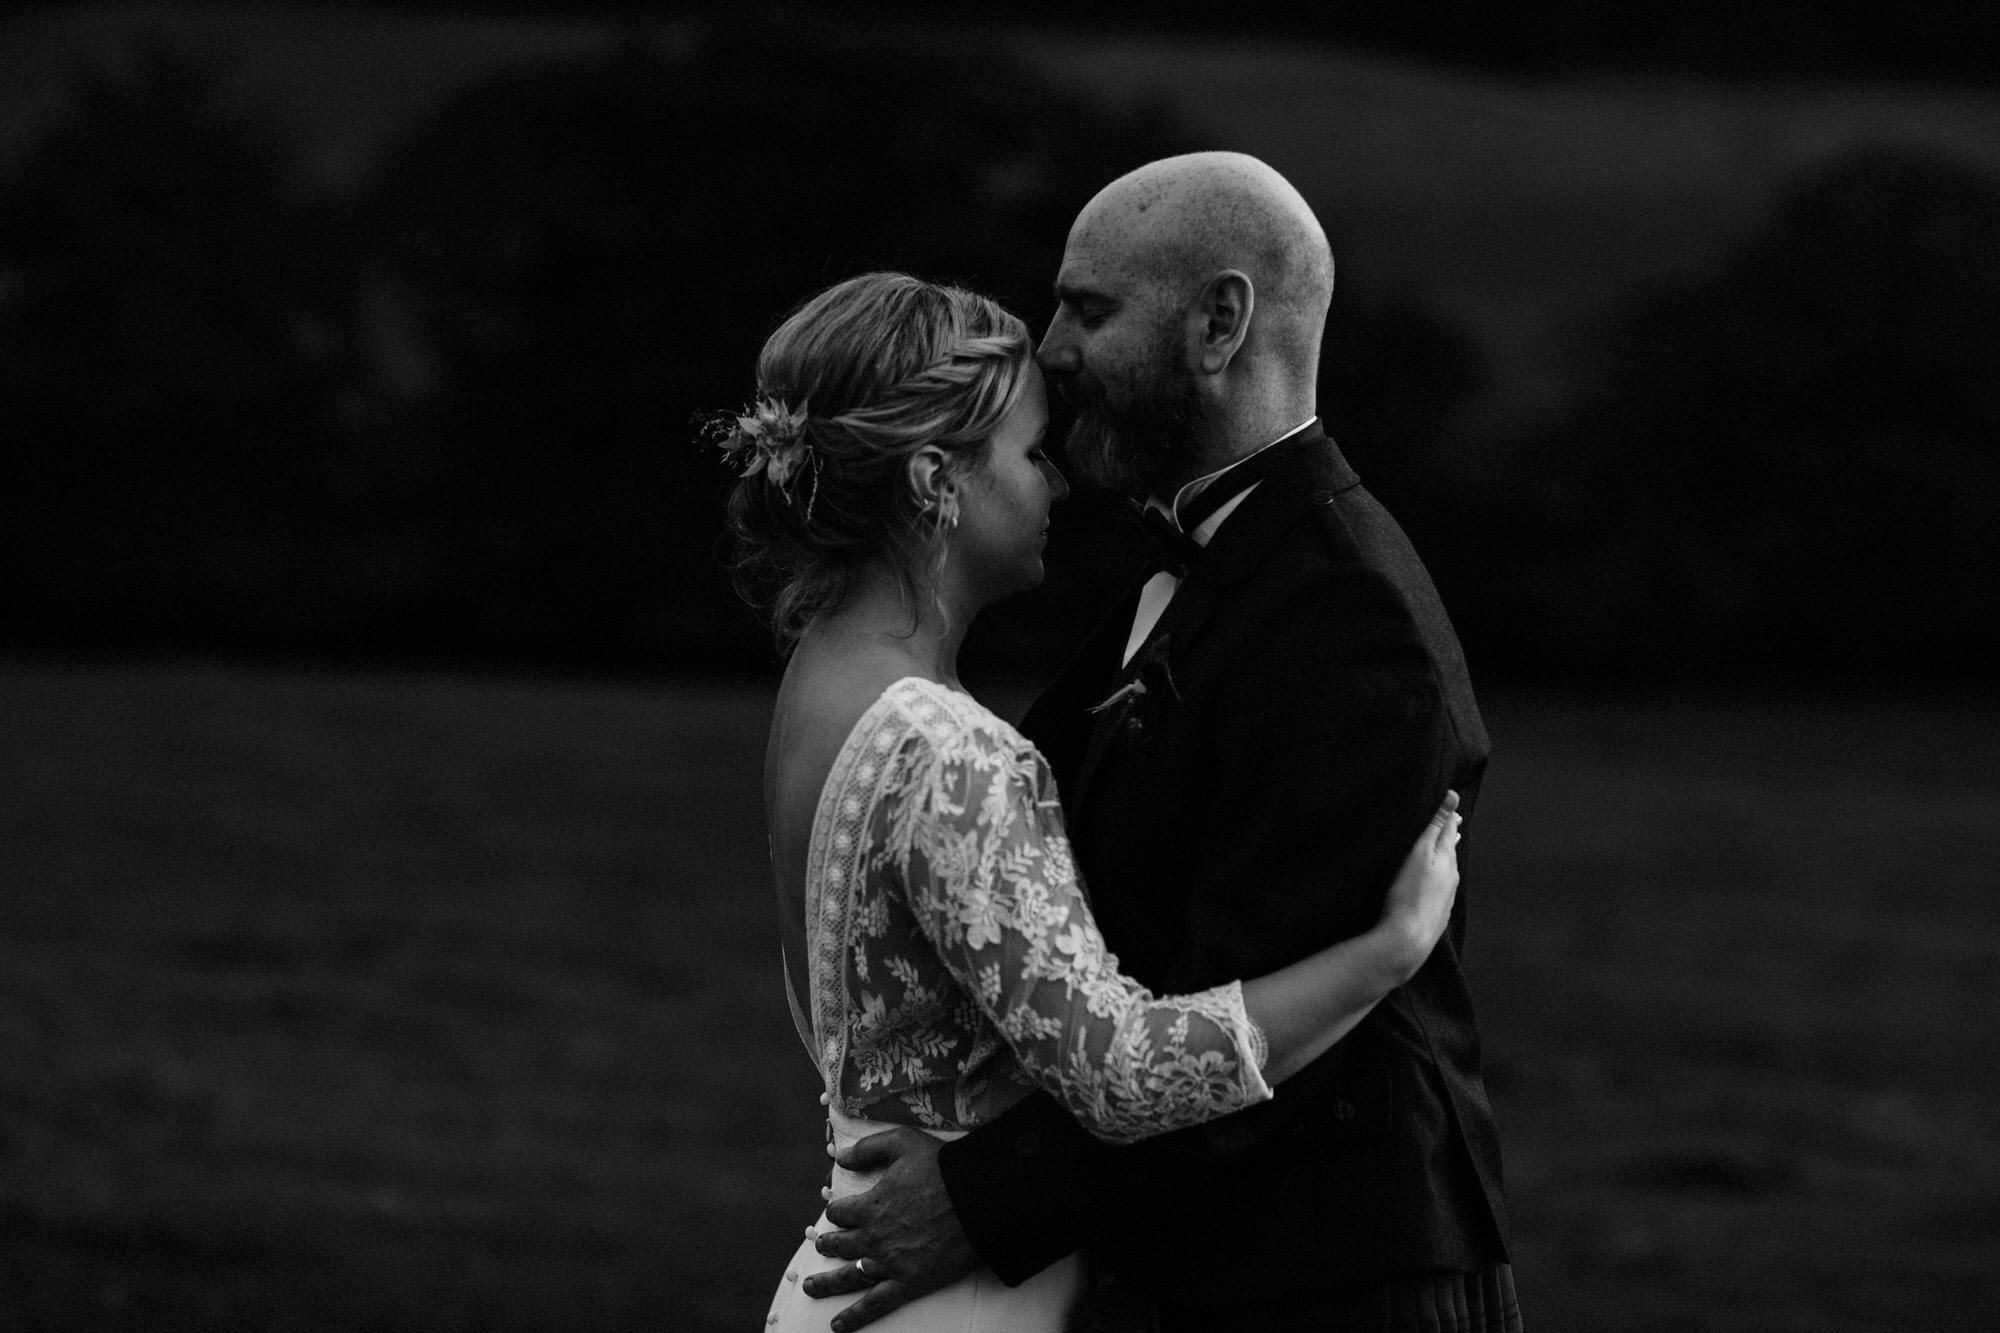 069 TIN SHED KNOCKRAICH WEDDING AUTUMN ZOE ALEXANDRA PHOTOGRAPHY